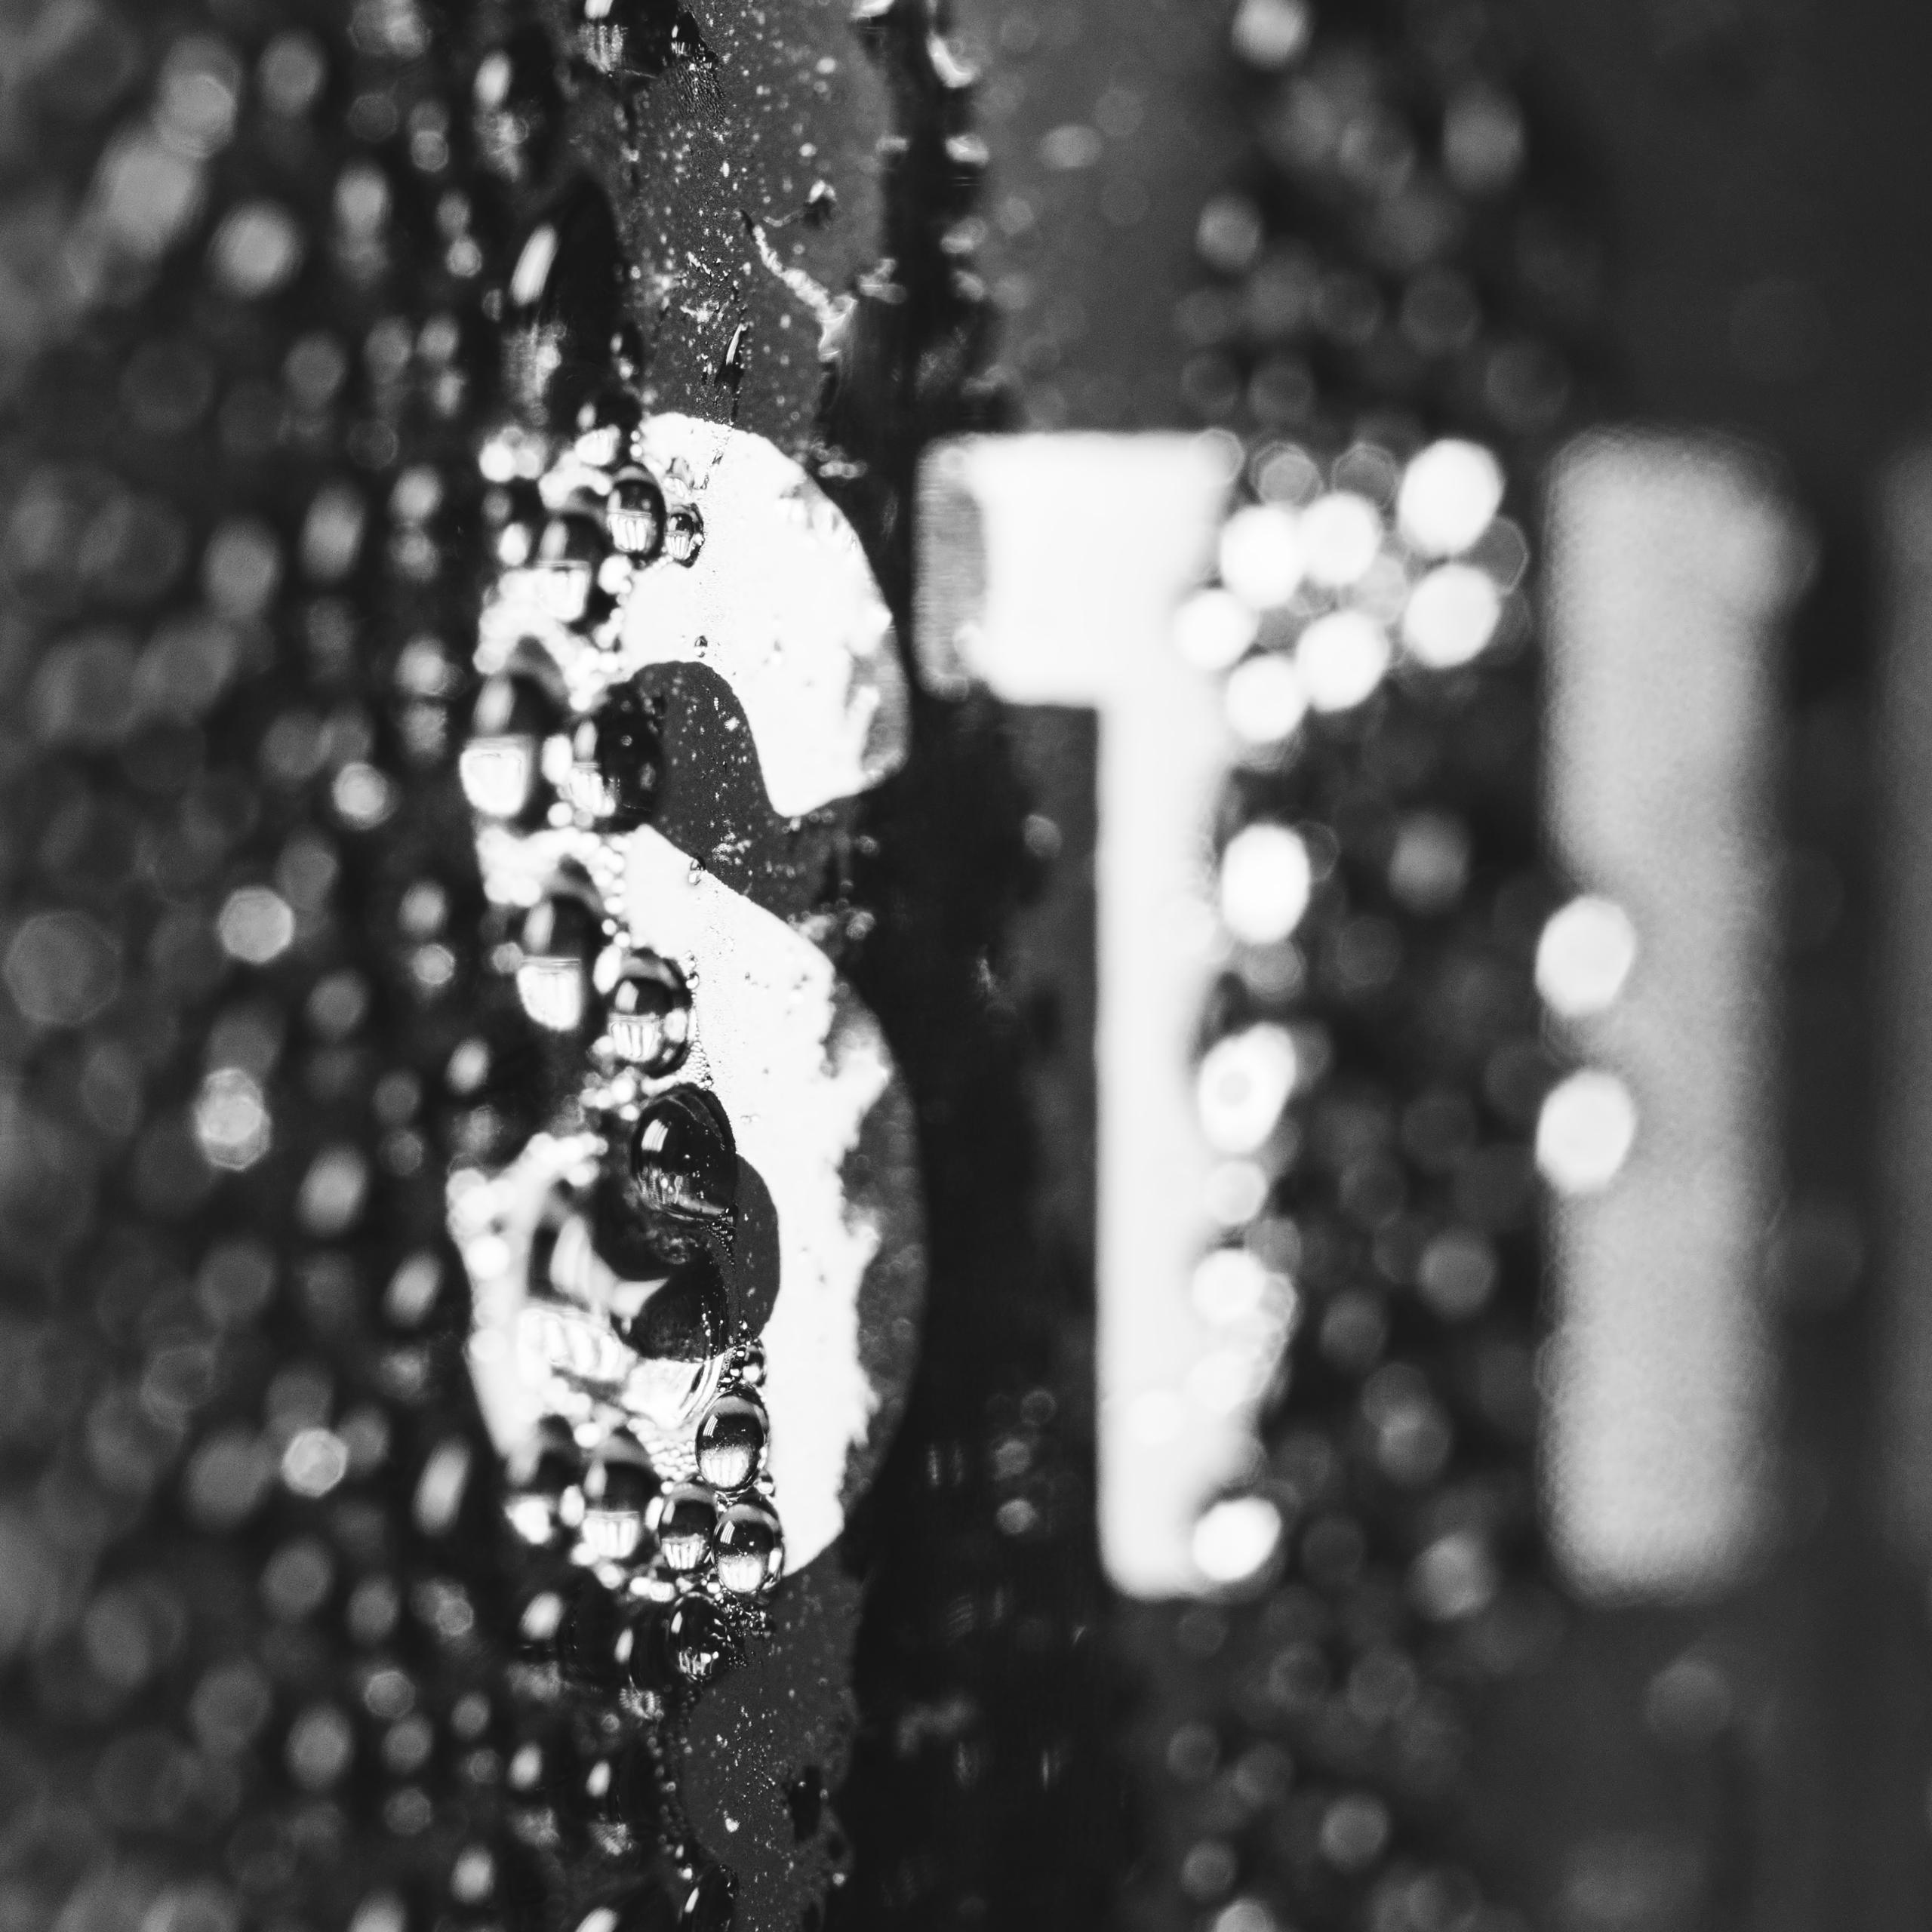 Droplets water glass bottle. hu - paddyc29   ello